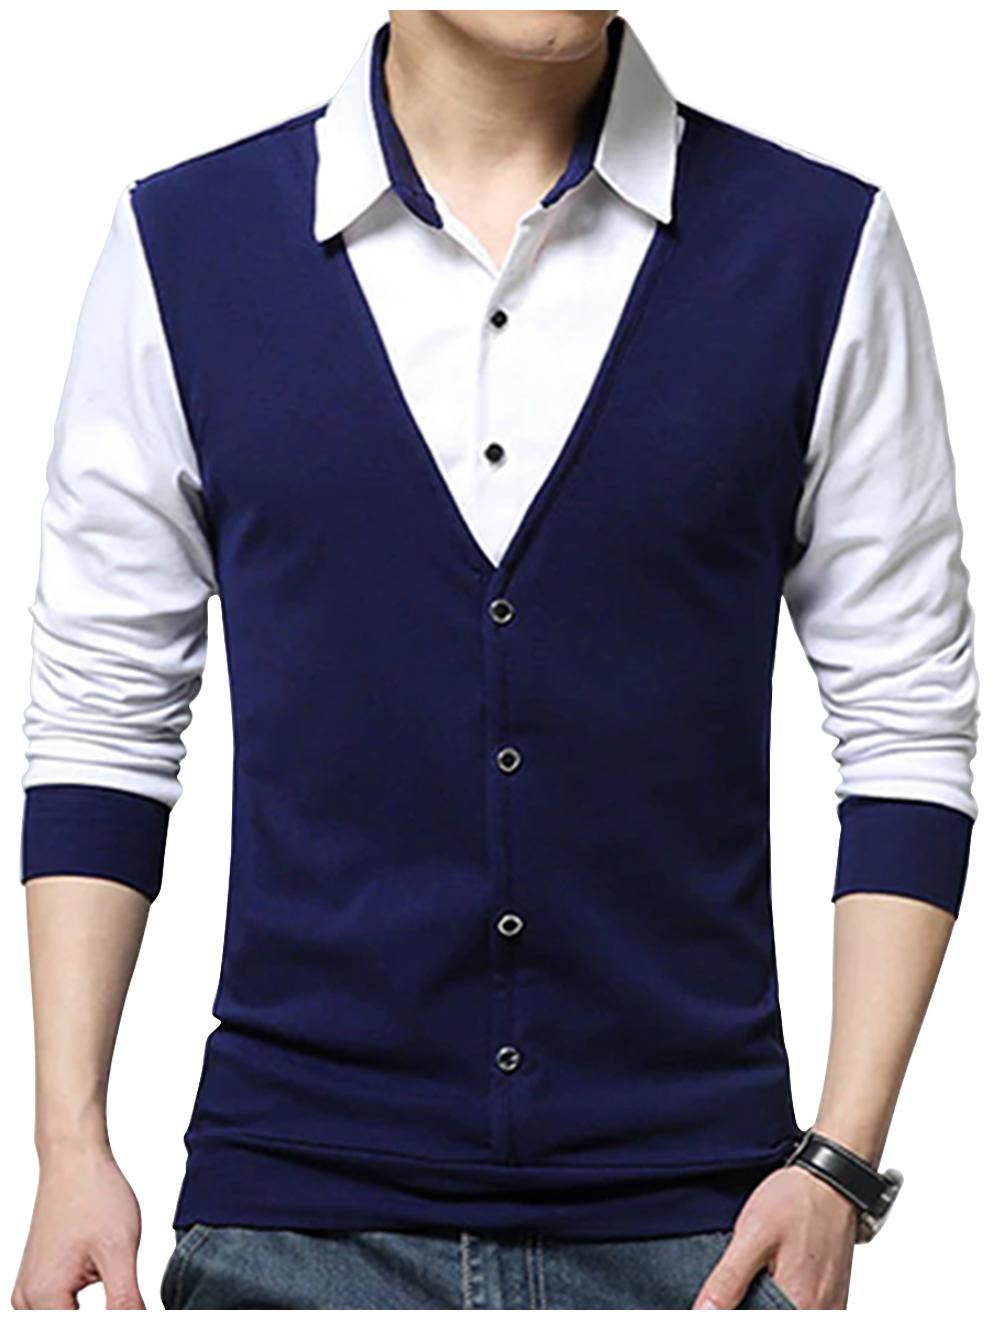 EYEBOGLER Cotton Colorblocked Blue & White Color T-Shirt For Men